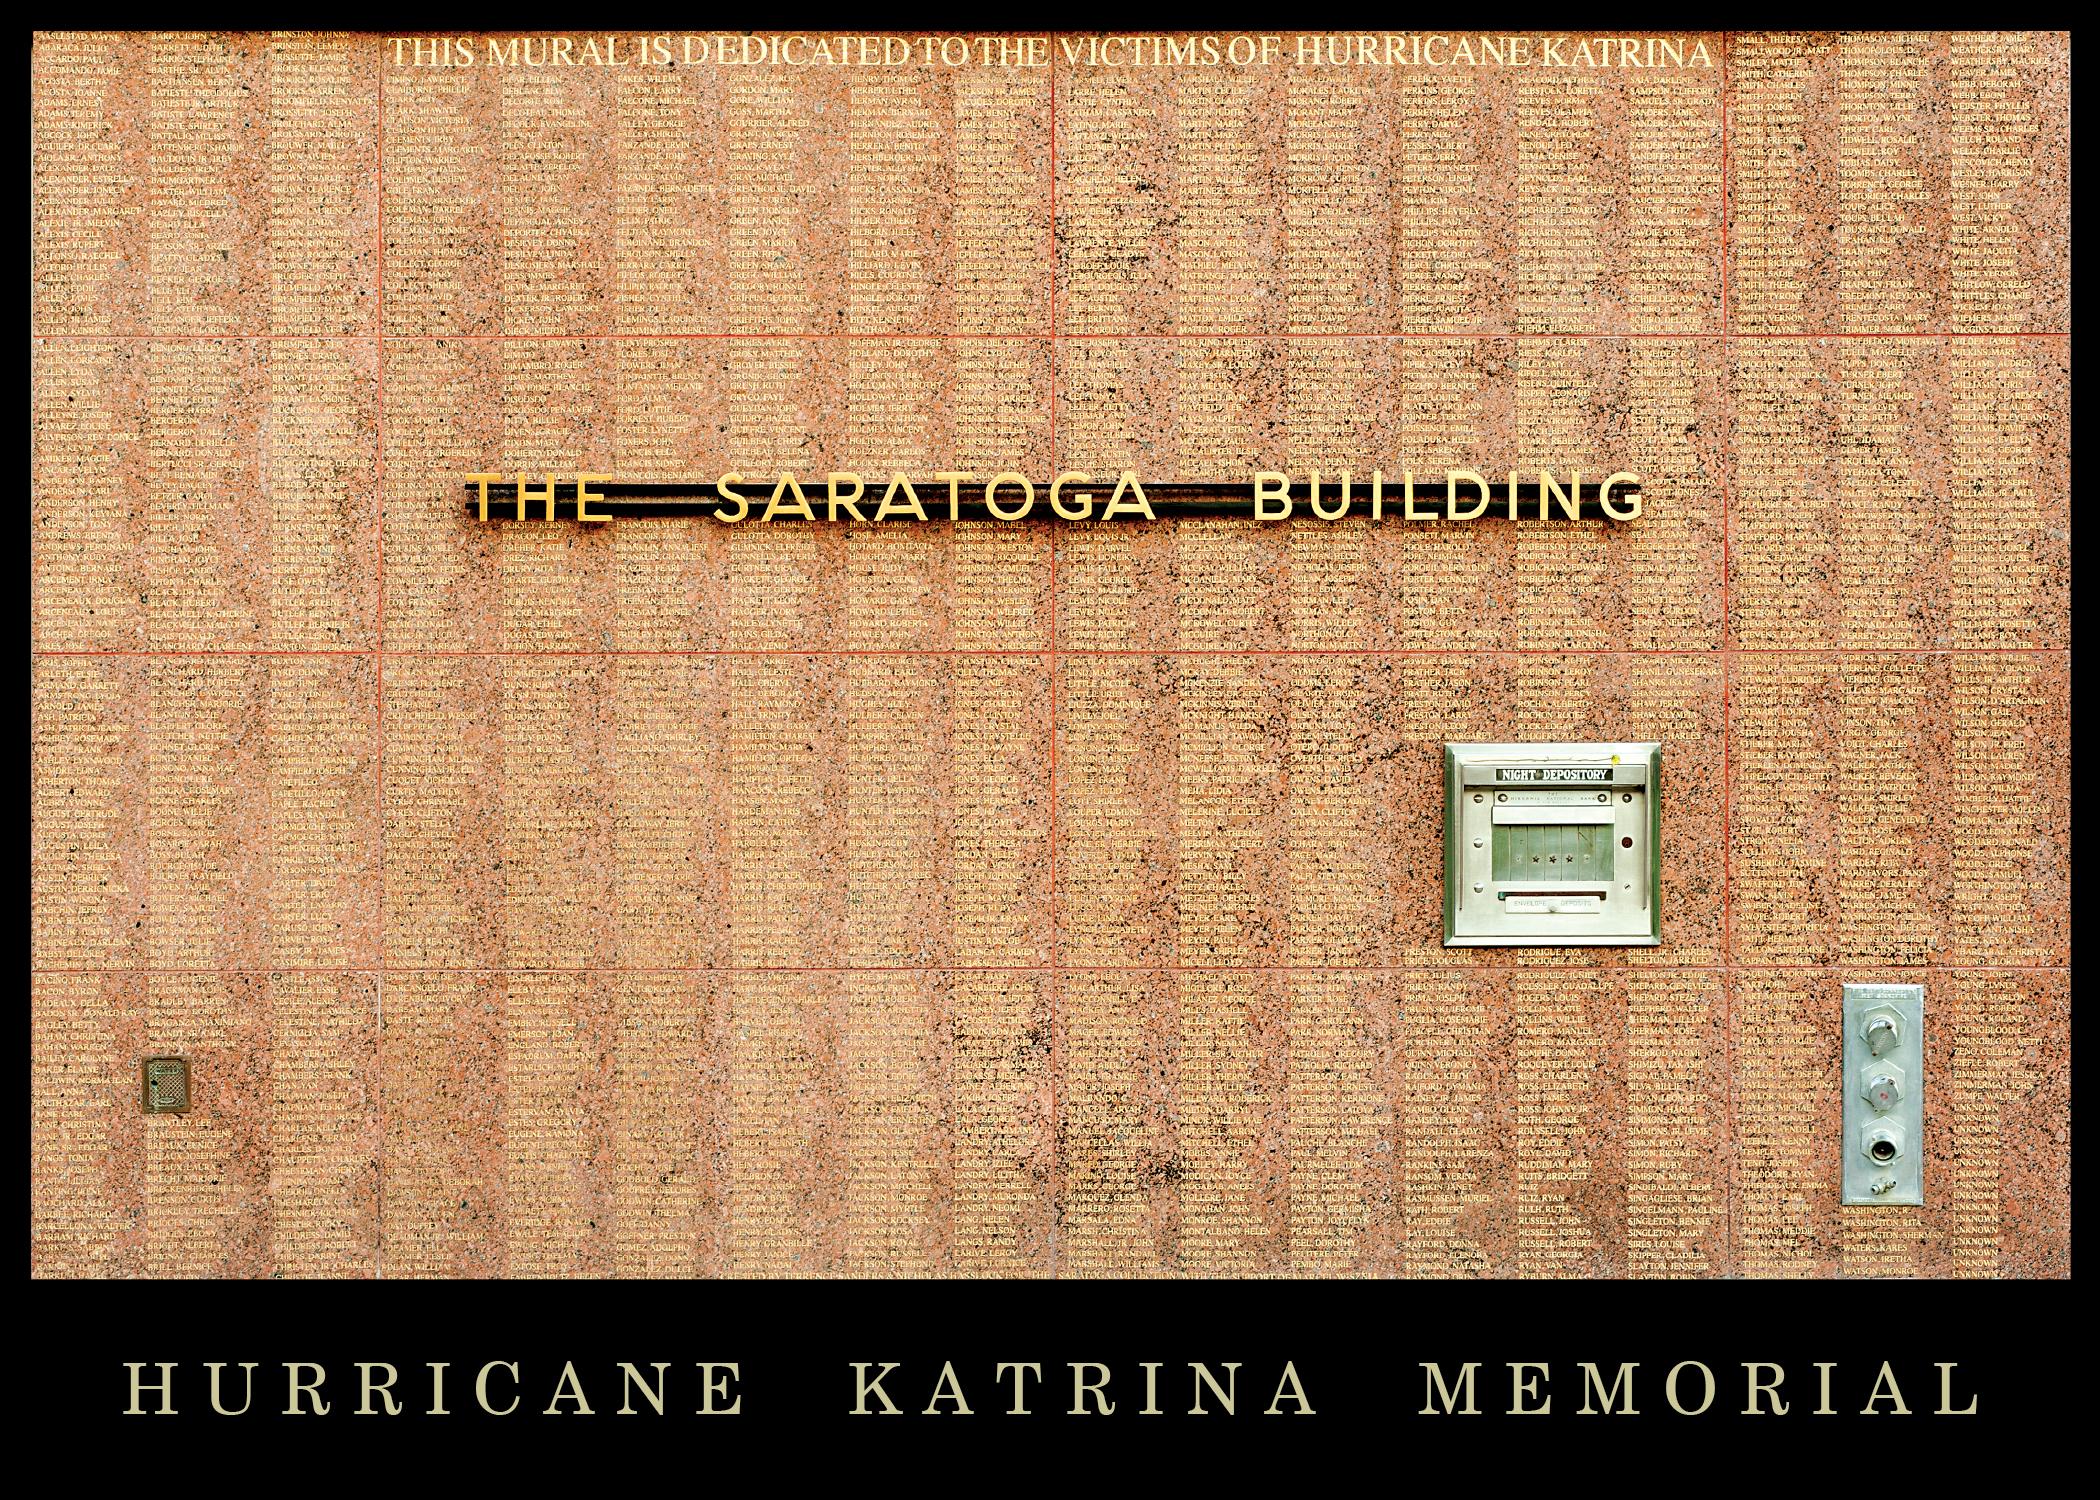 Hurricane Katrina Memorial photo.jpg